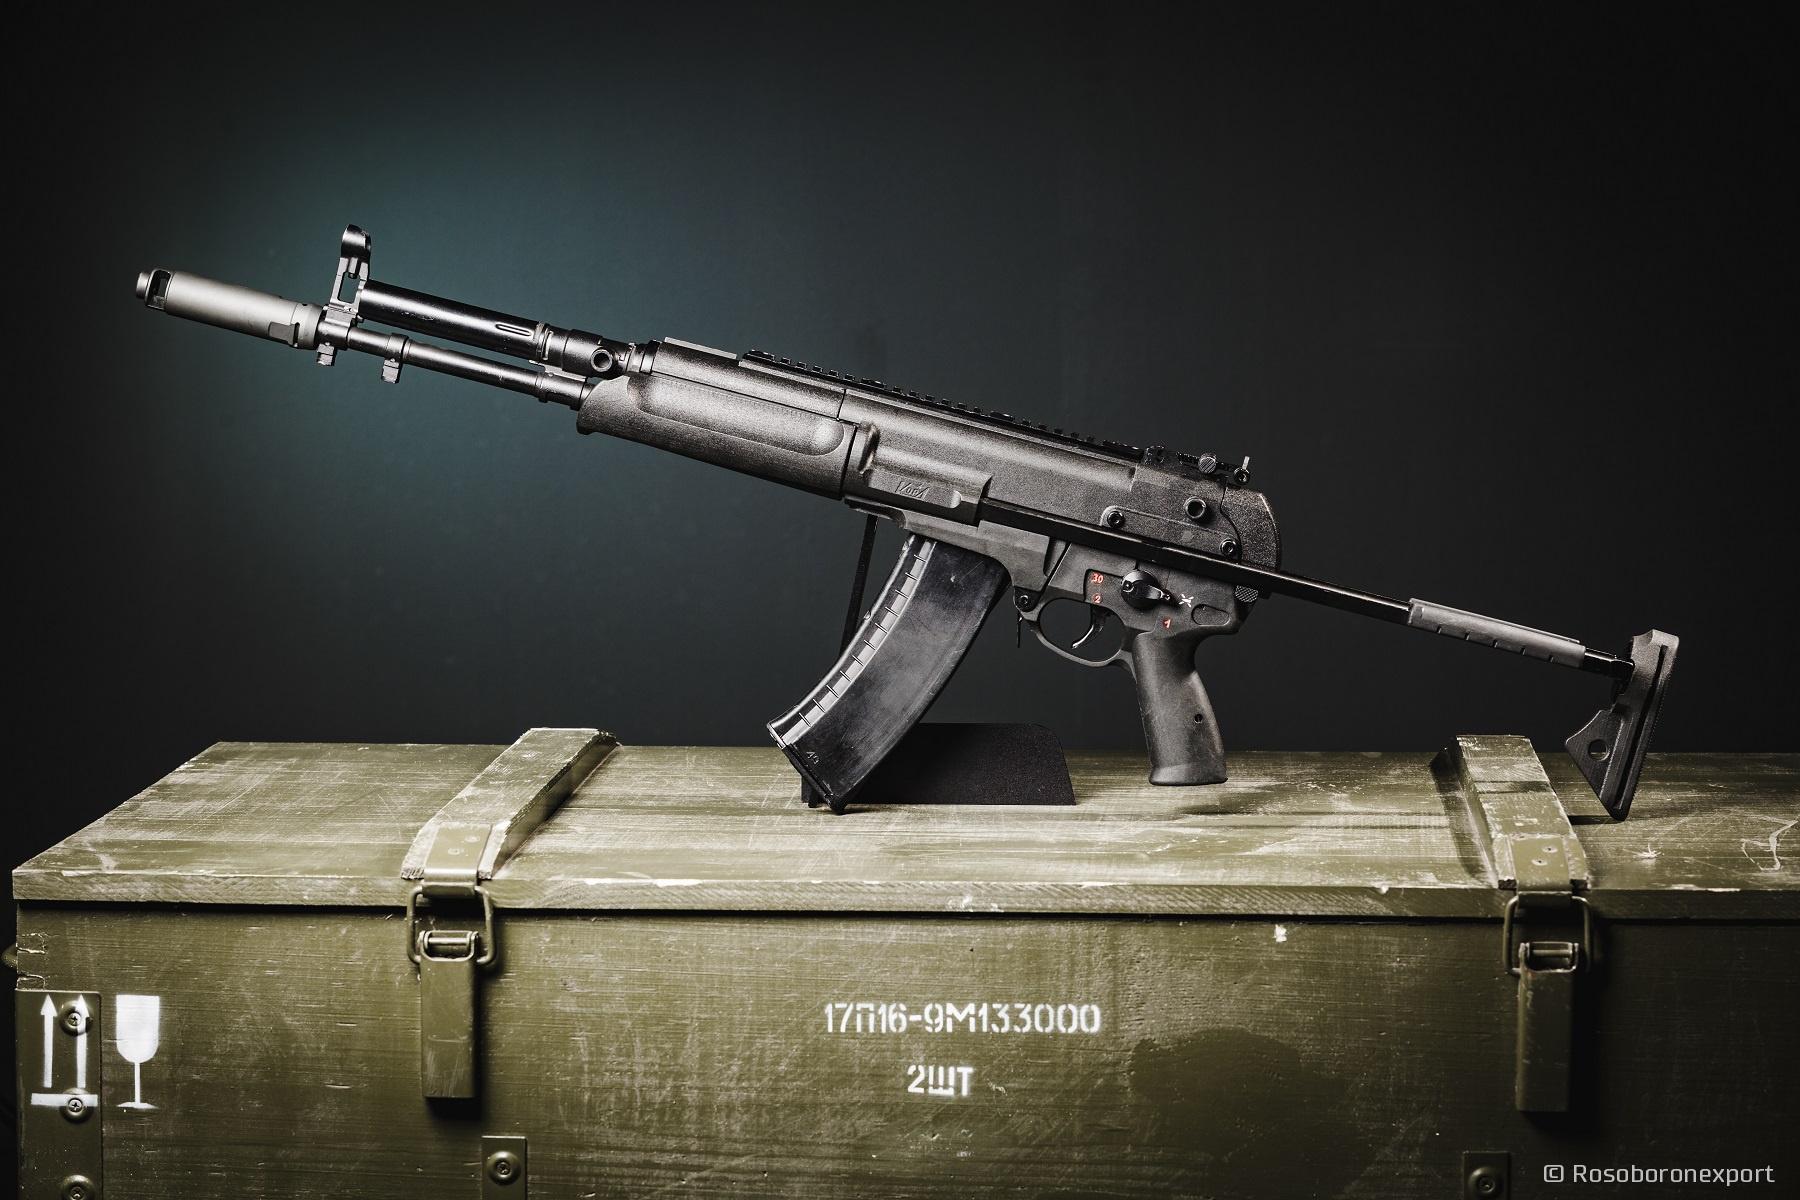 Russian Assault Rifles/Carbines/Machine Guns Thread: #2 - Page 10 15e4e701c3fe7bb151f0557c81850467